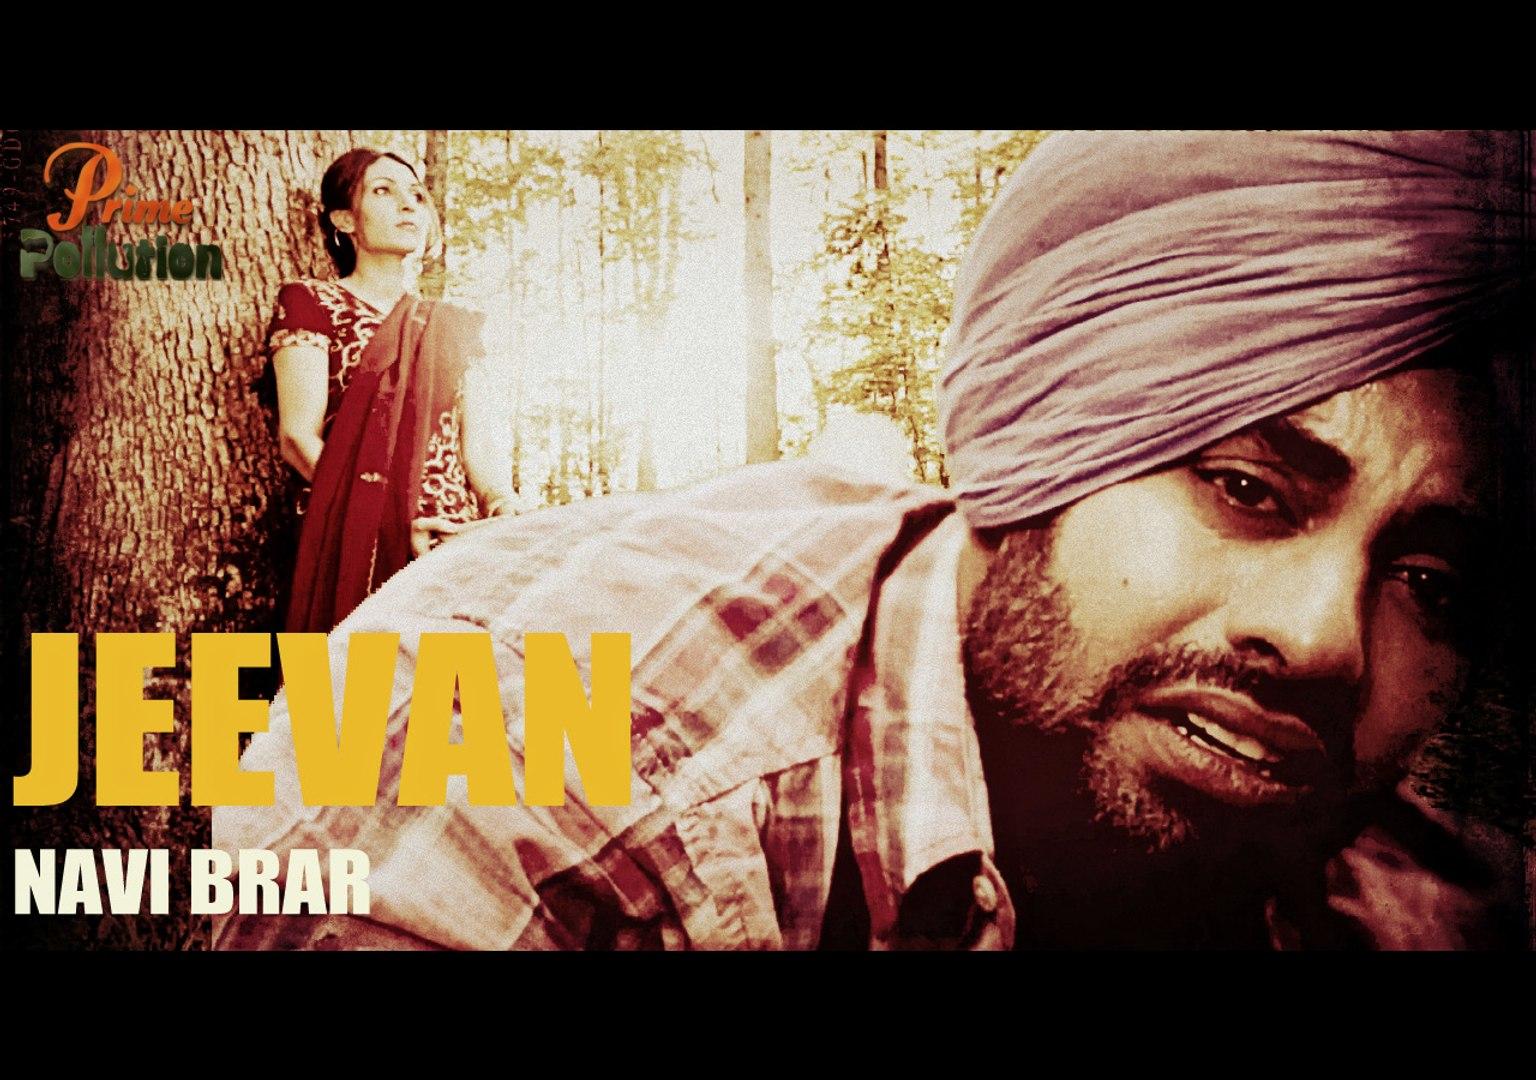 New Latest Punjabi Song 2015 JEEVAN | LEATHER LIFE | sad top hit 2014 indian pakistani rock movies b